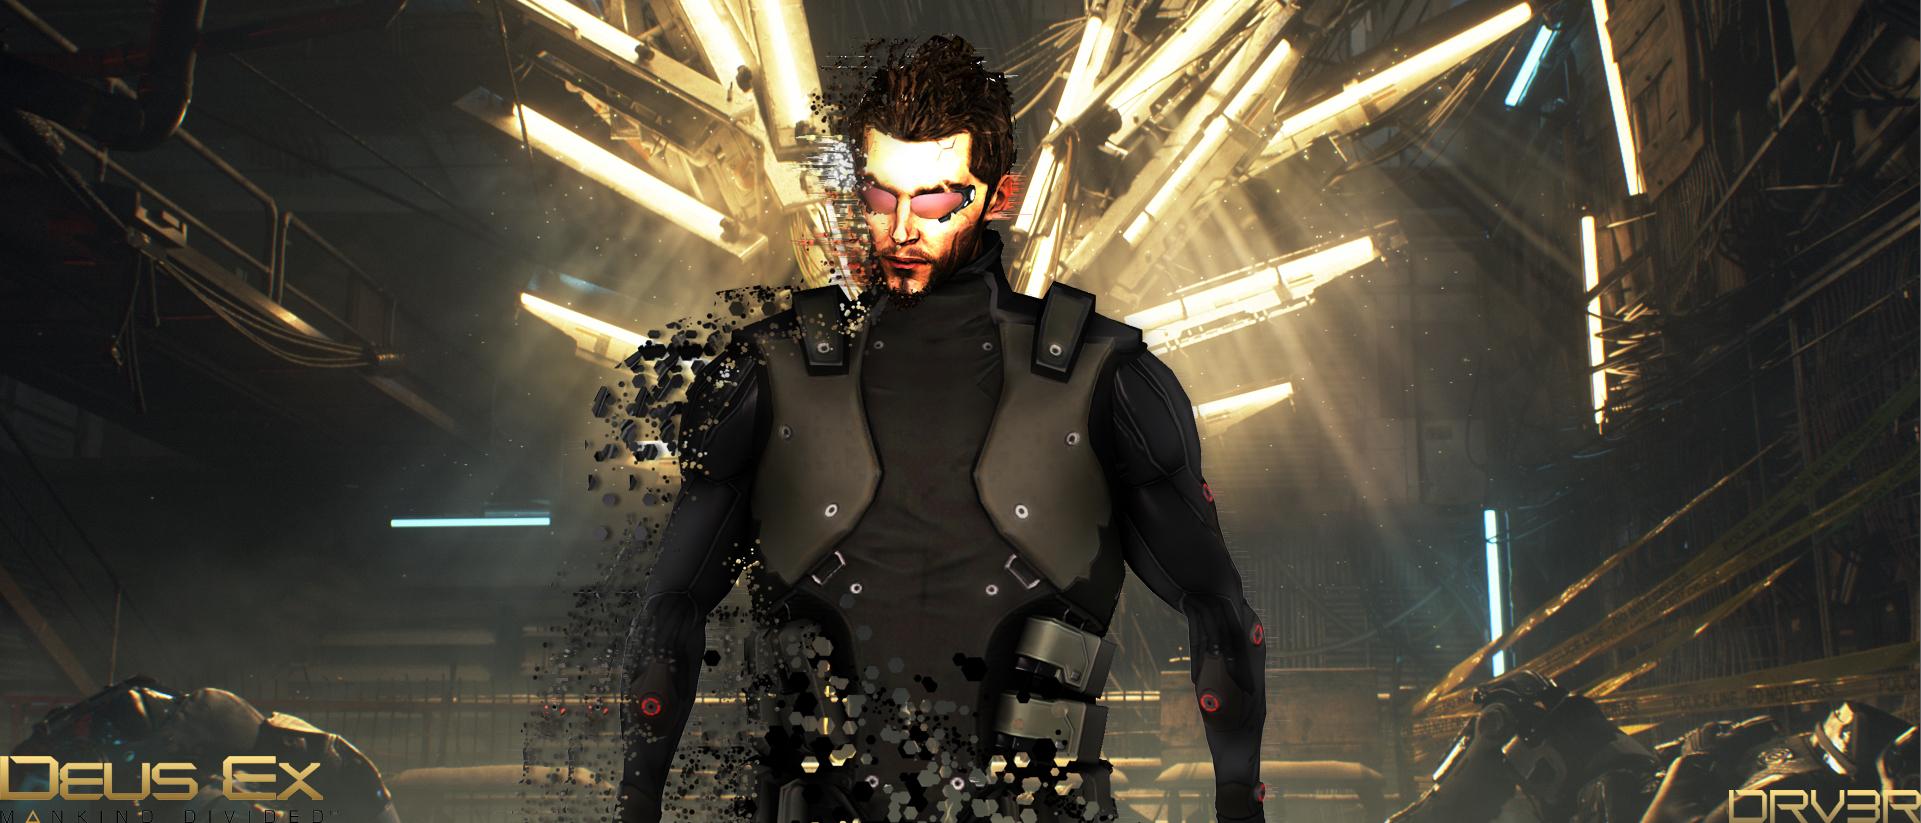 Deus Ex Mankind Divided P Hd Abstract Desktop Wallpaper Syanart